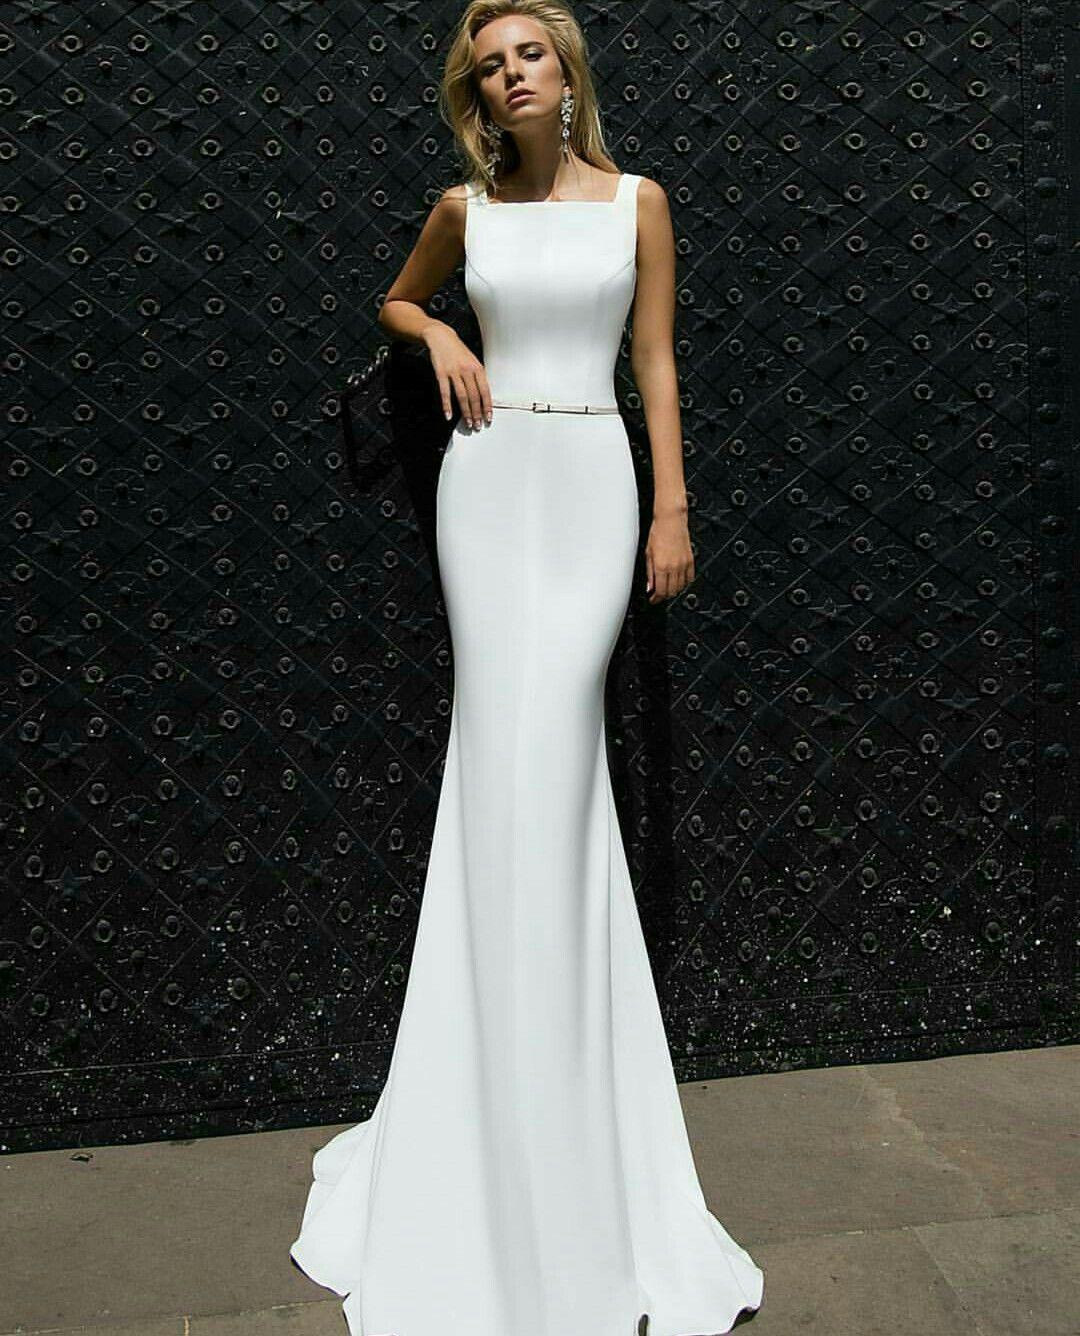 2f59fbbb564 simple wedding dress elegant. simple wedding dress elegant White ...